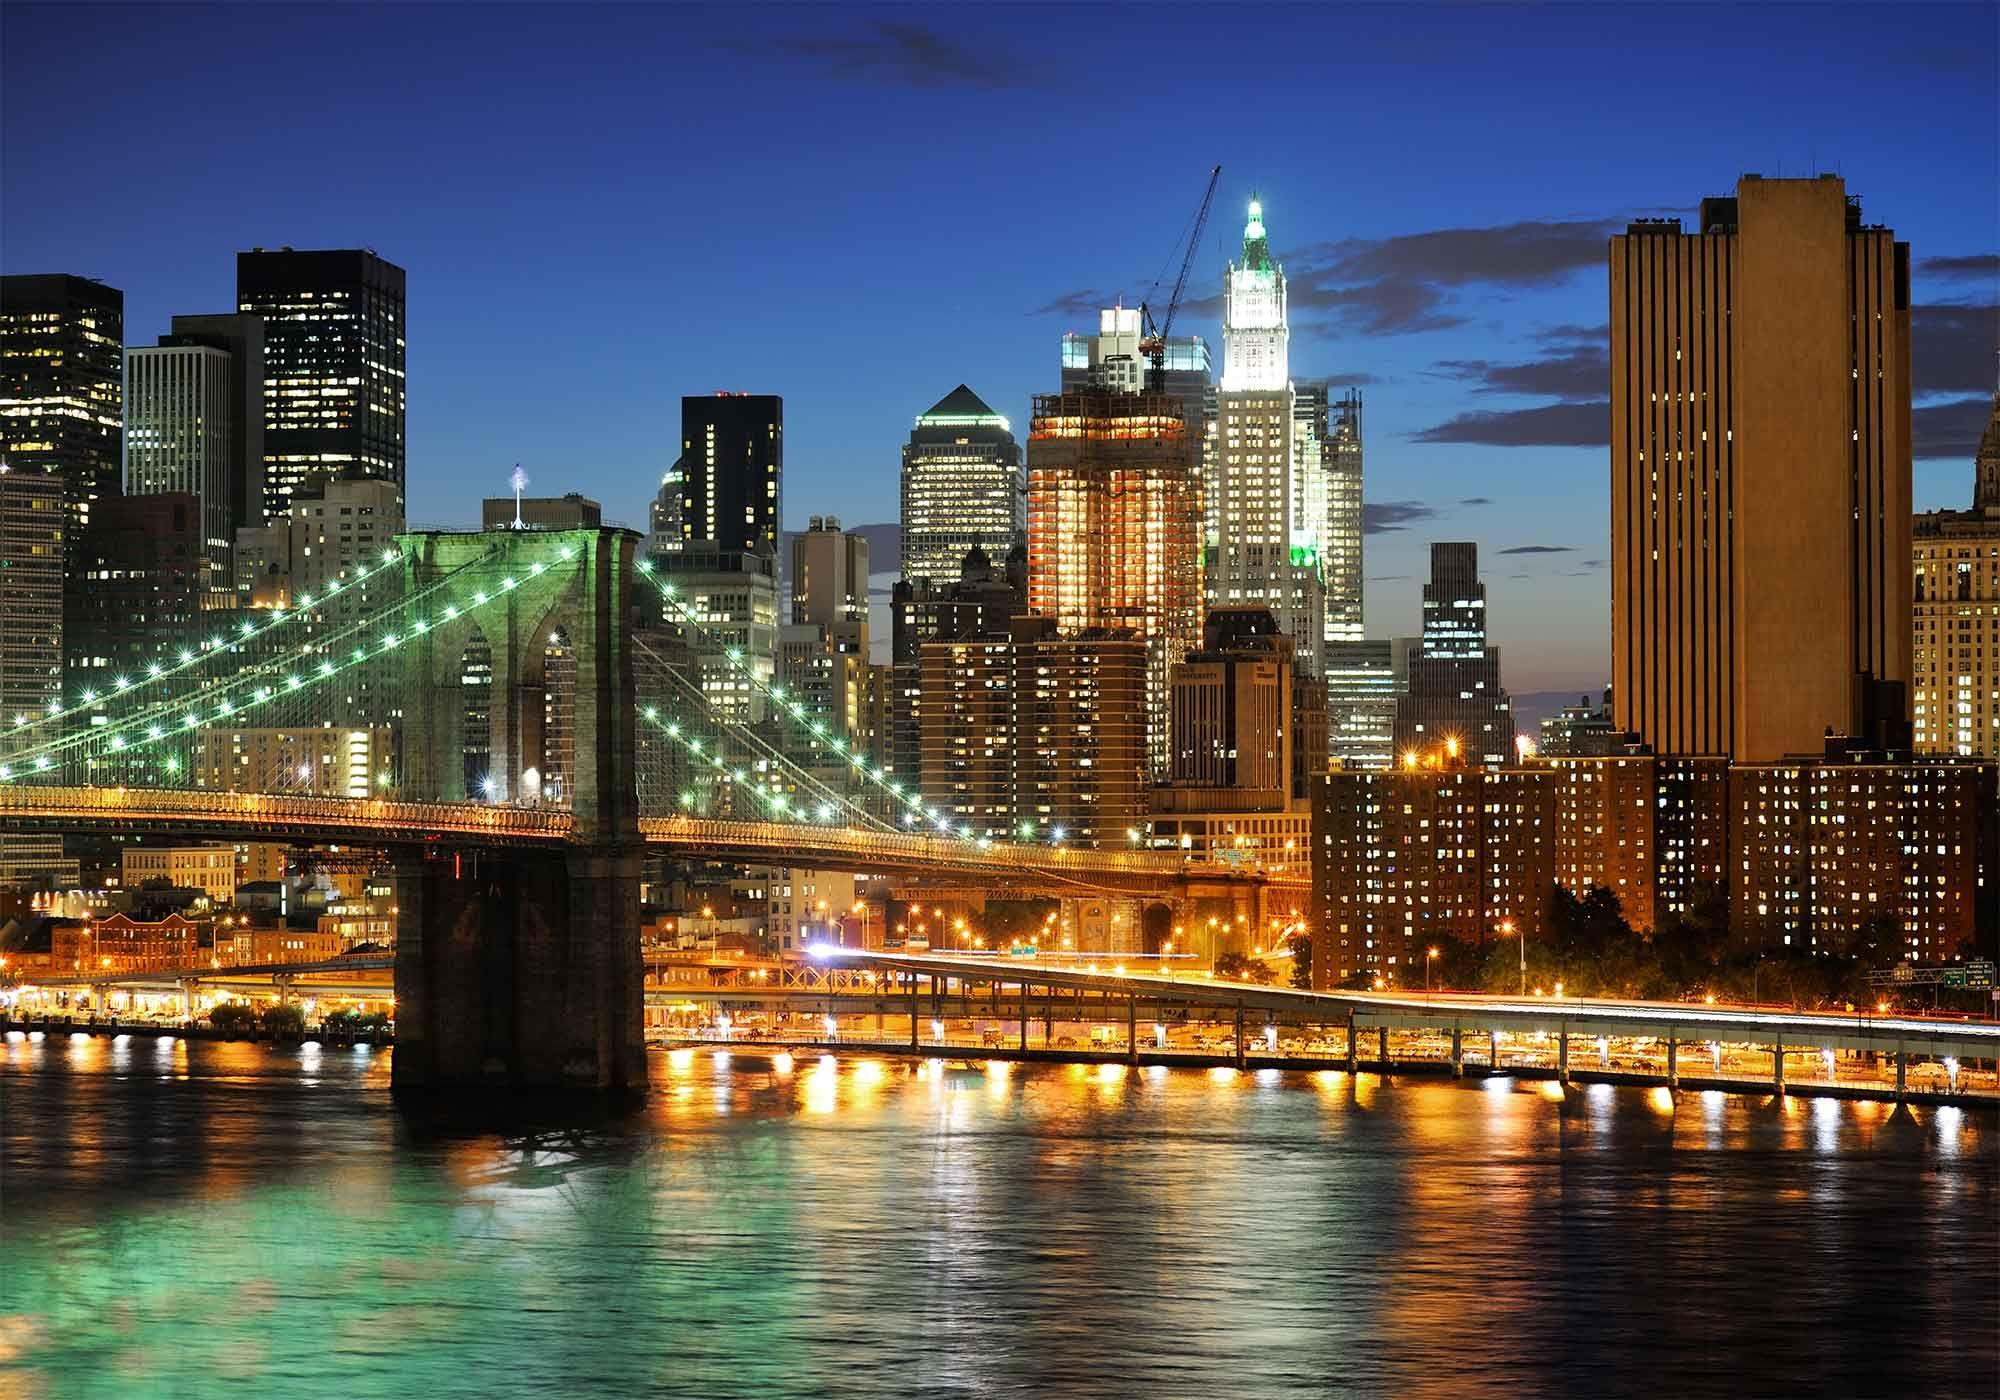 Beautiful Night View Of Brooklyn Bridge